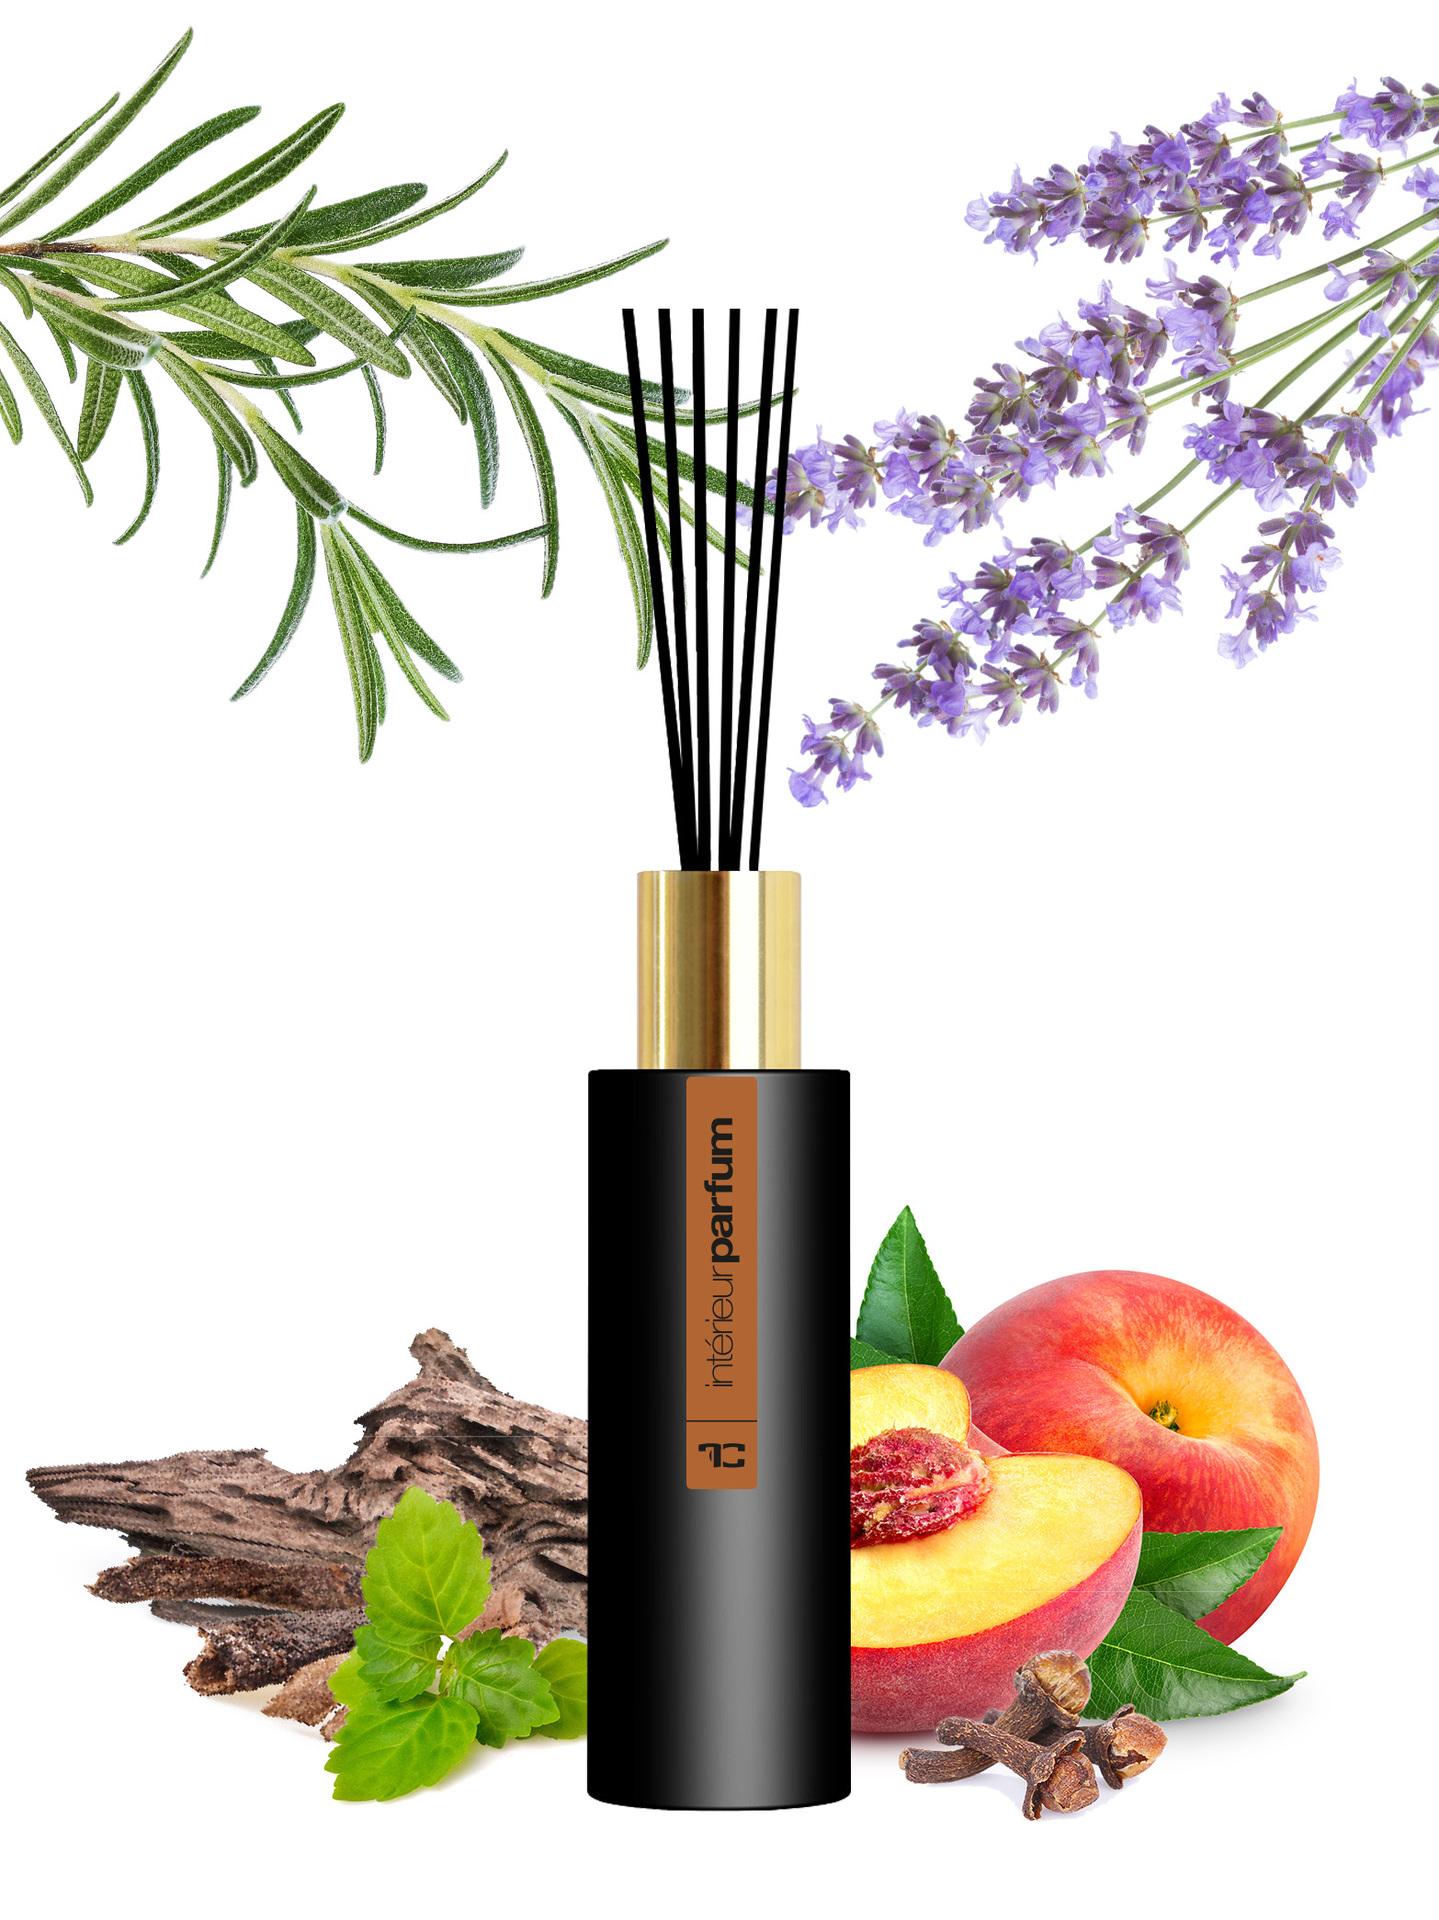 Interiérový parfém, NUIT DE MADAGASCAR, vonný roztok s vysokým obsahem parfémové kompozice